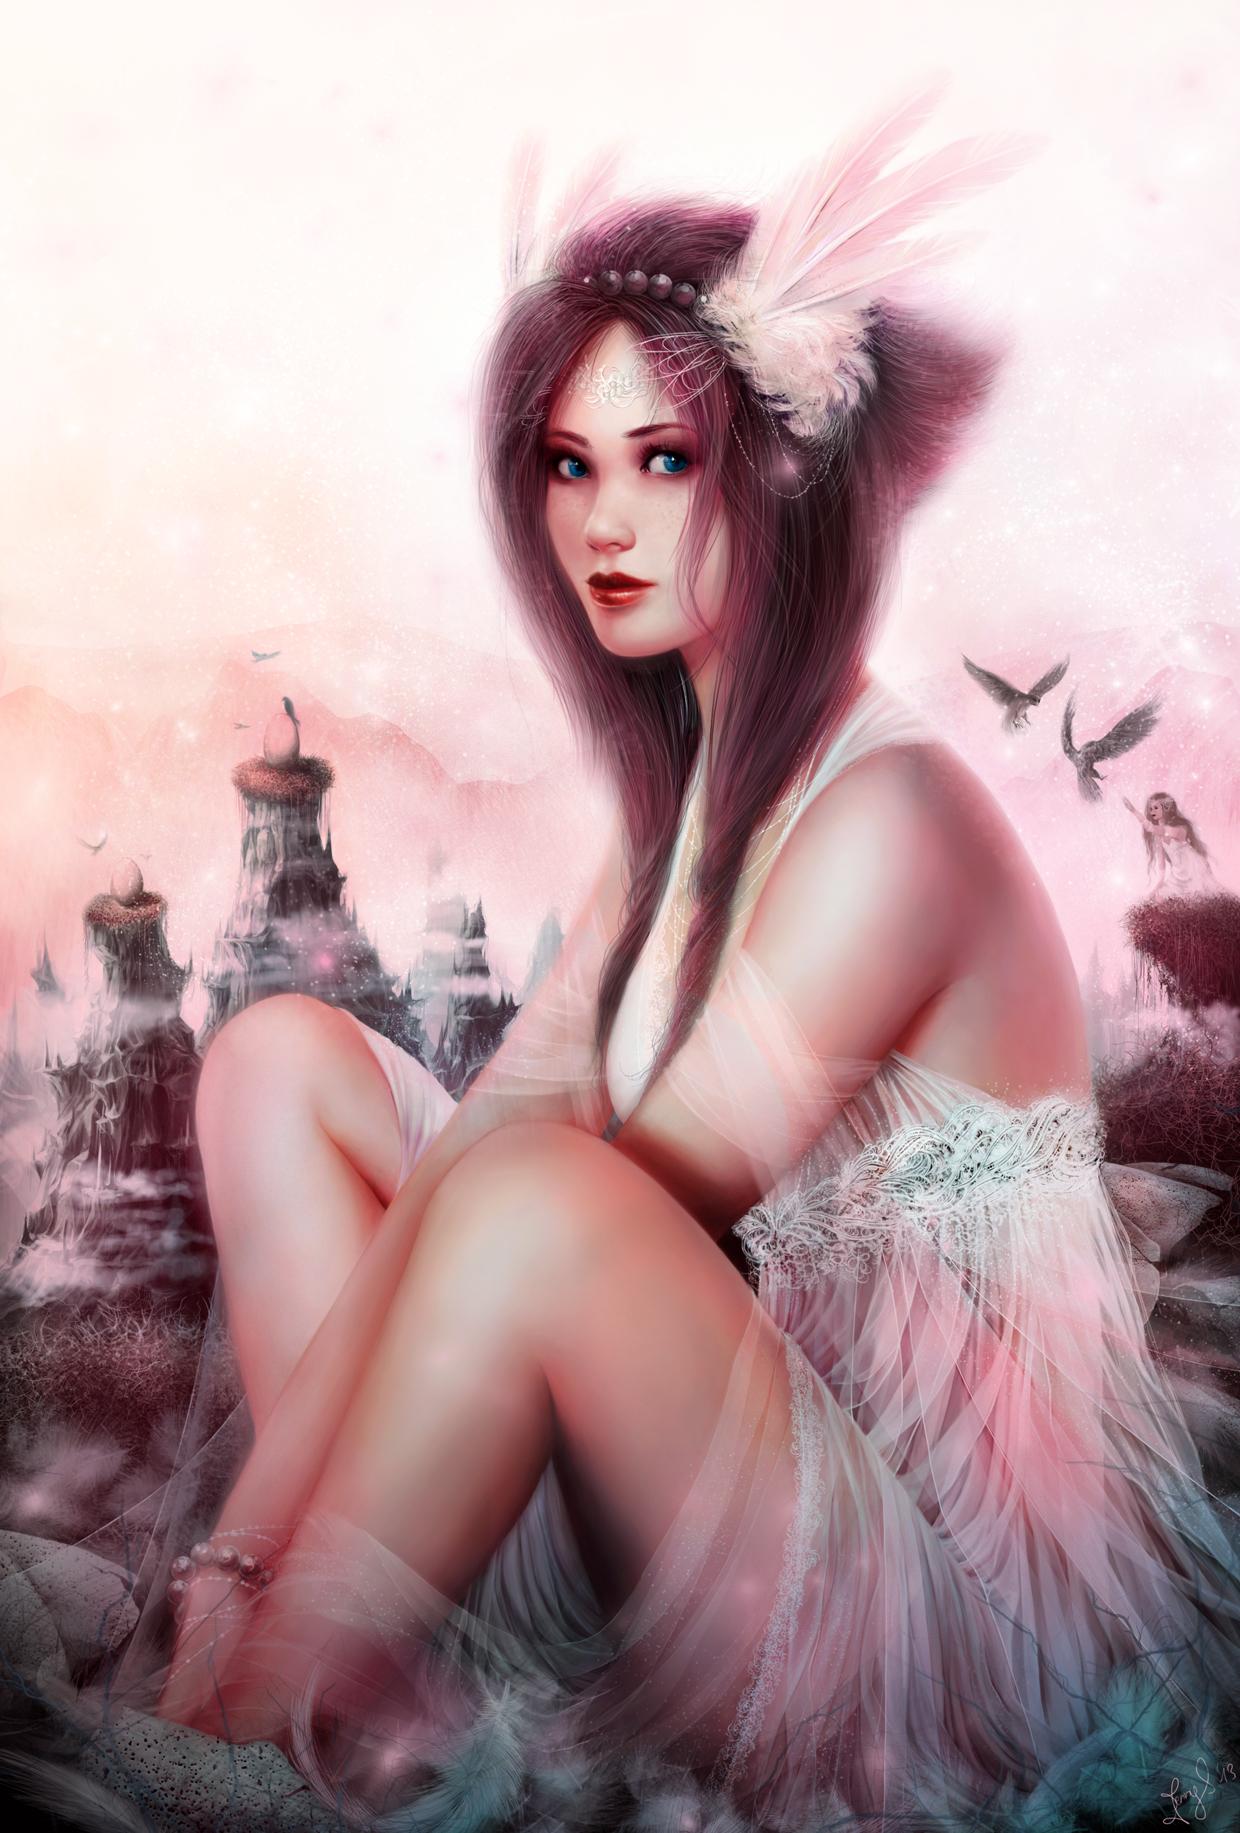 The Innocent Bird by Jennyeight